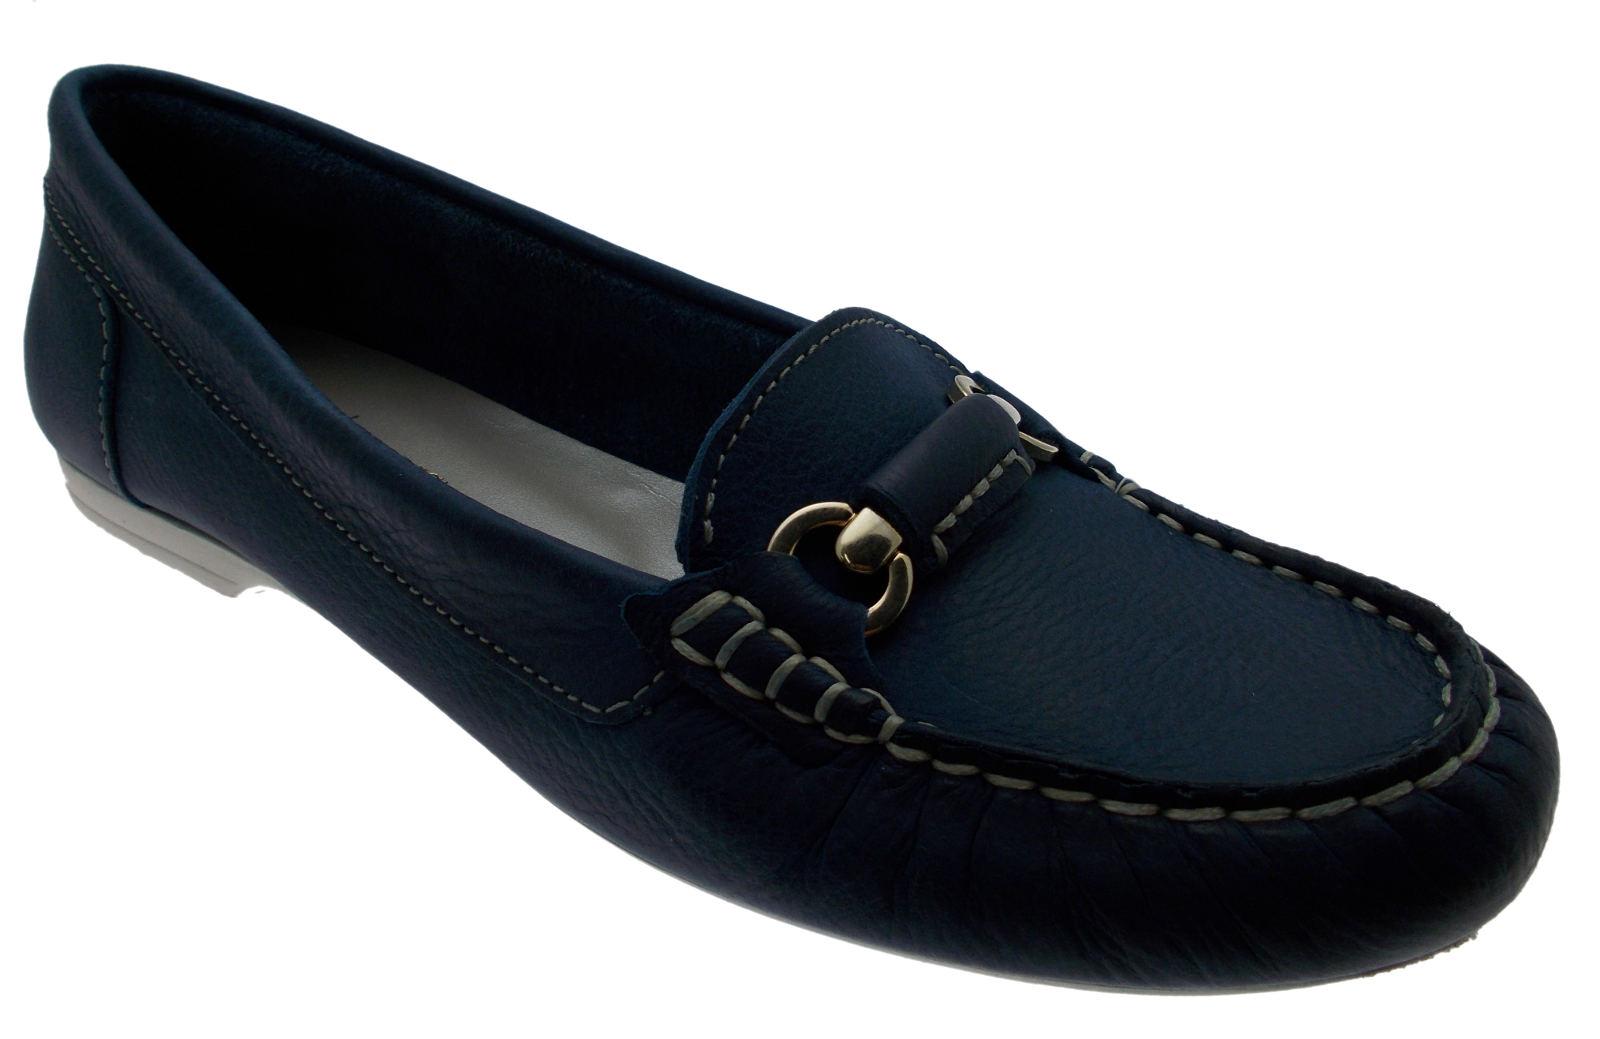 mocassin lederen aviator blue jeans klem artikel 442 Calzaturificio R.P